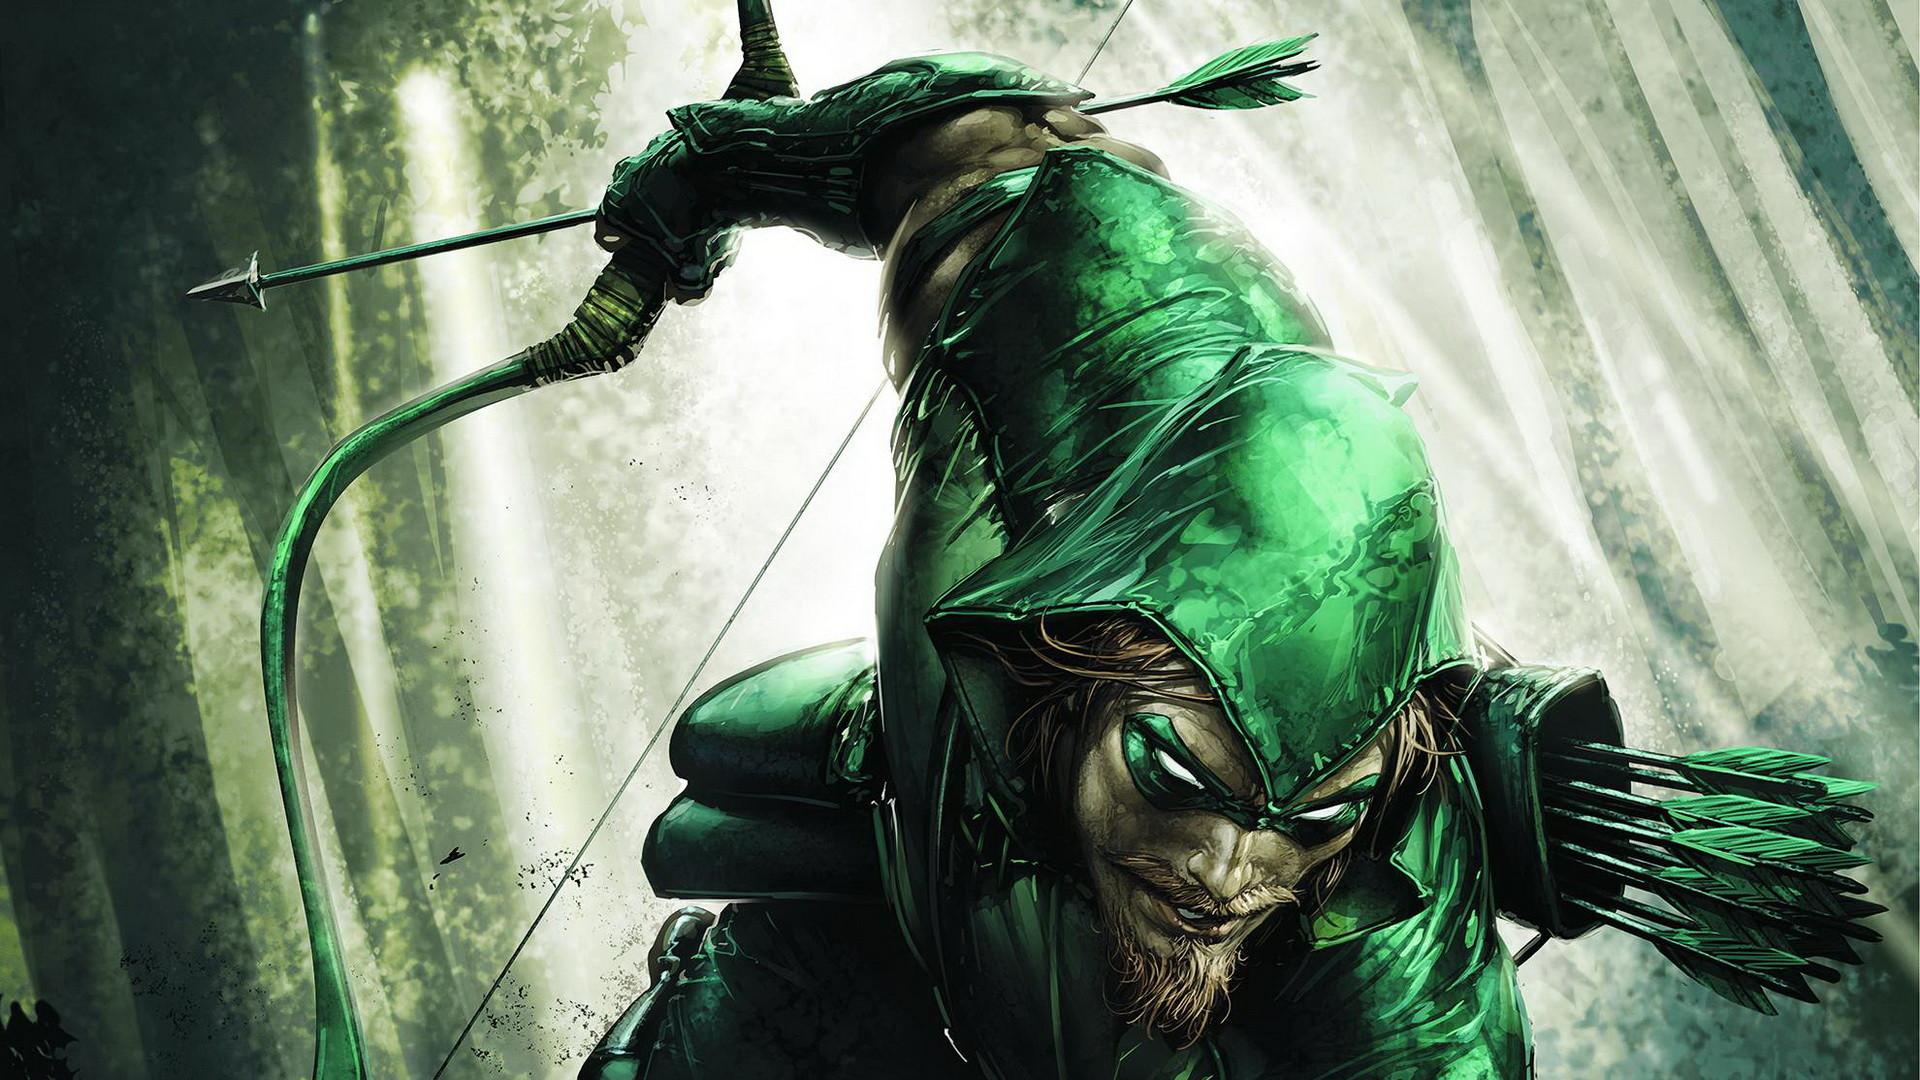 Animation & Drawn Wallpapers (Official & Custom) 075 Battle Angel Alita, Green  Arrow, Guardians of the Galaxy & Kill La Kill